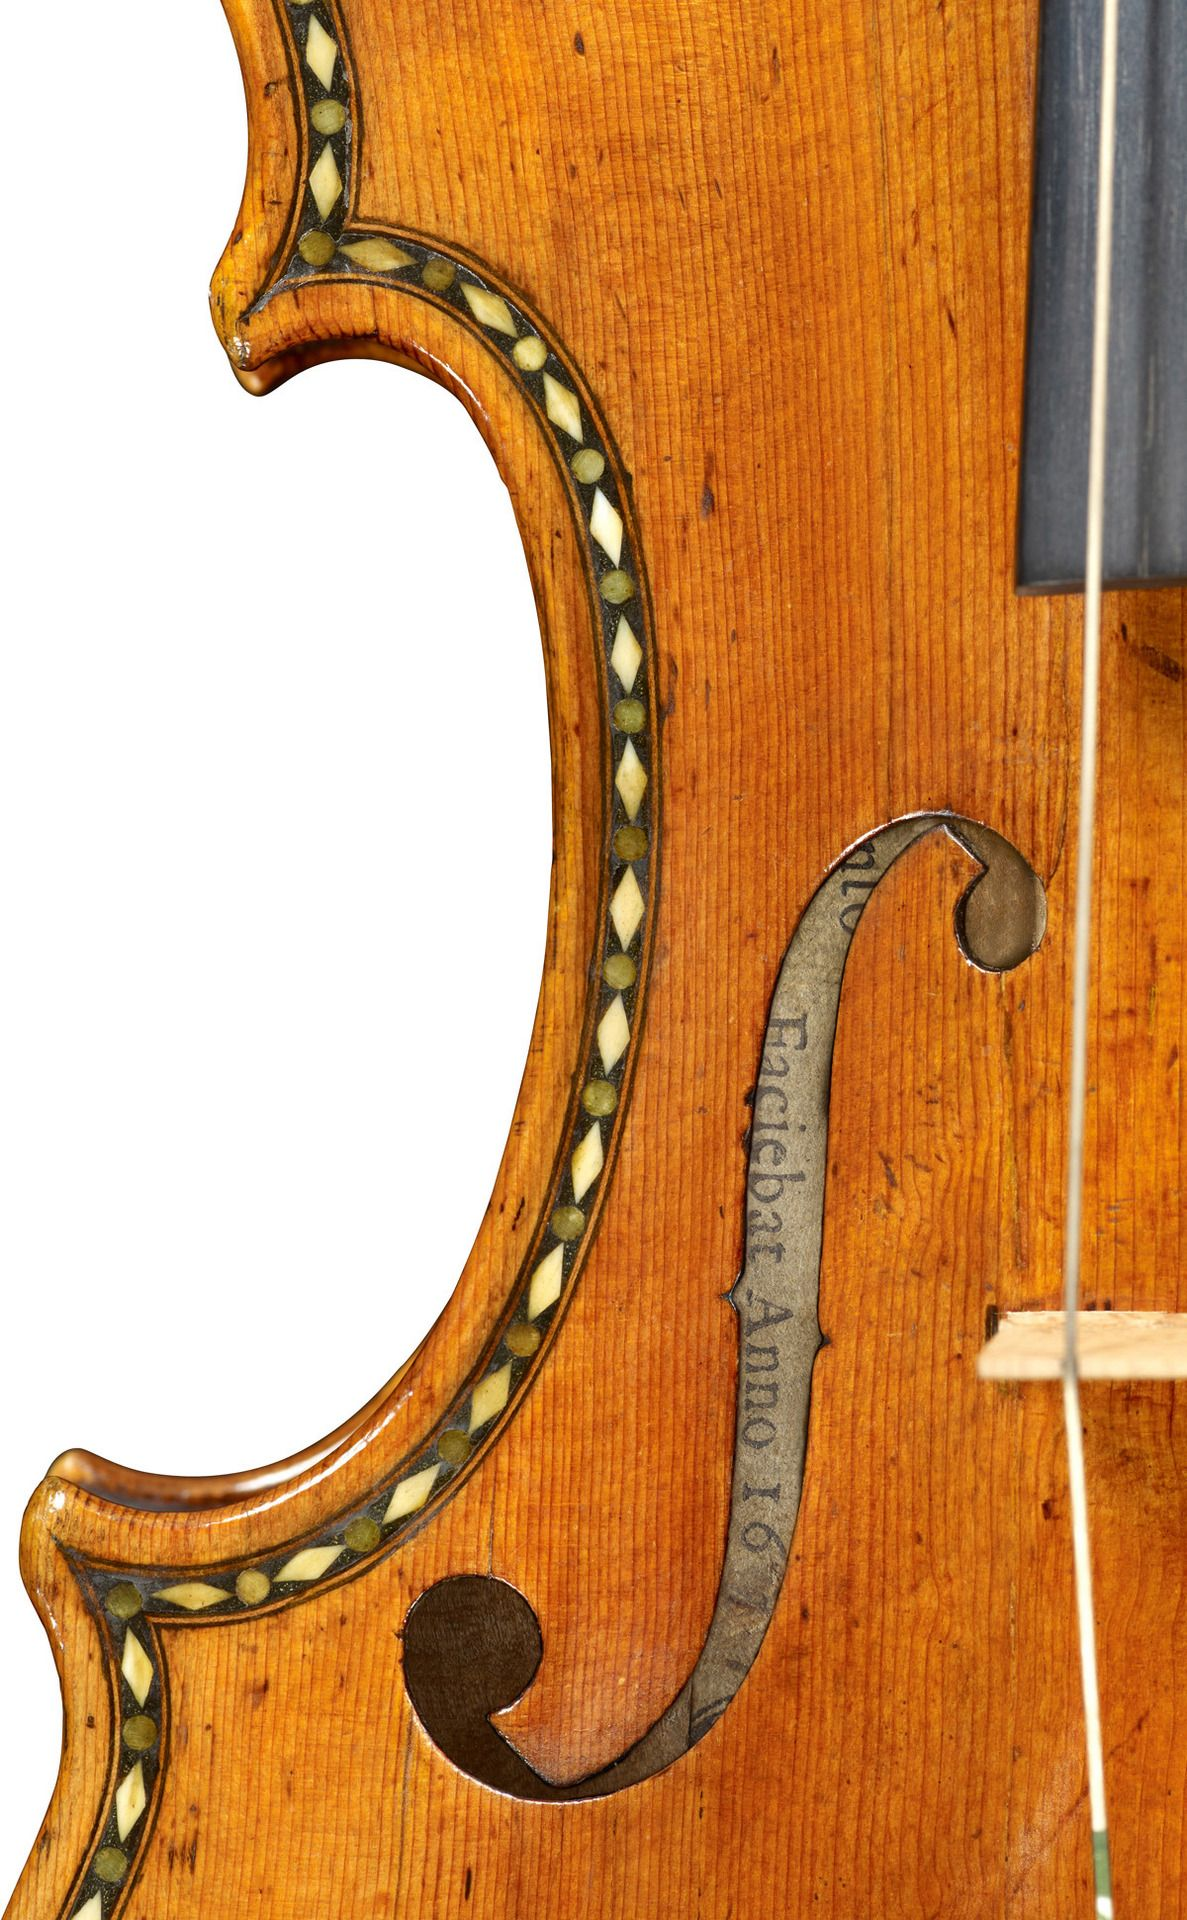 1677 Antonio Stradivari I Can Not Imagine How It Will Sound Even Better Than It Looks Stradivarius Violin Musical Instruments Violin